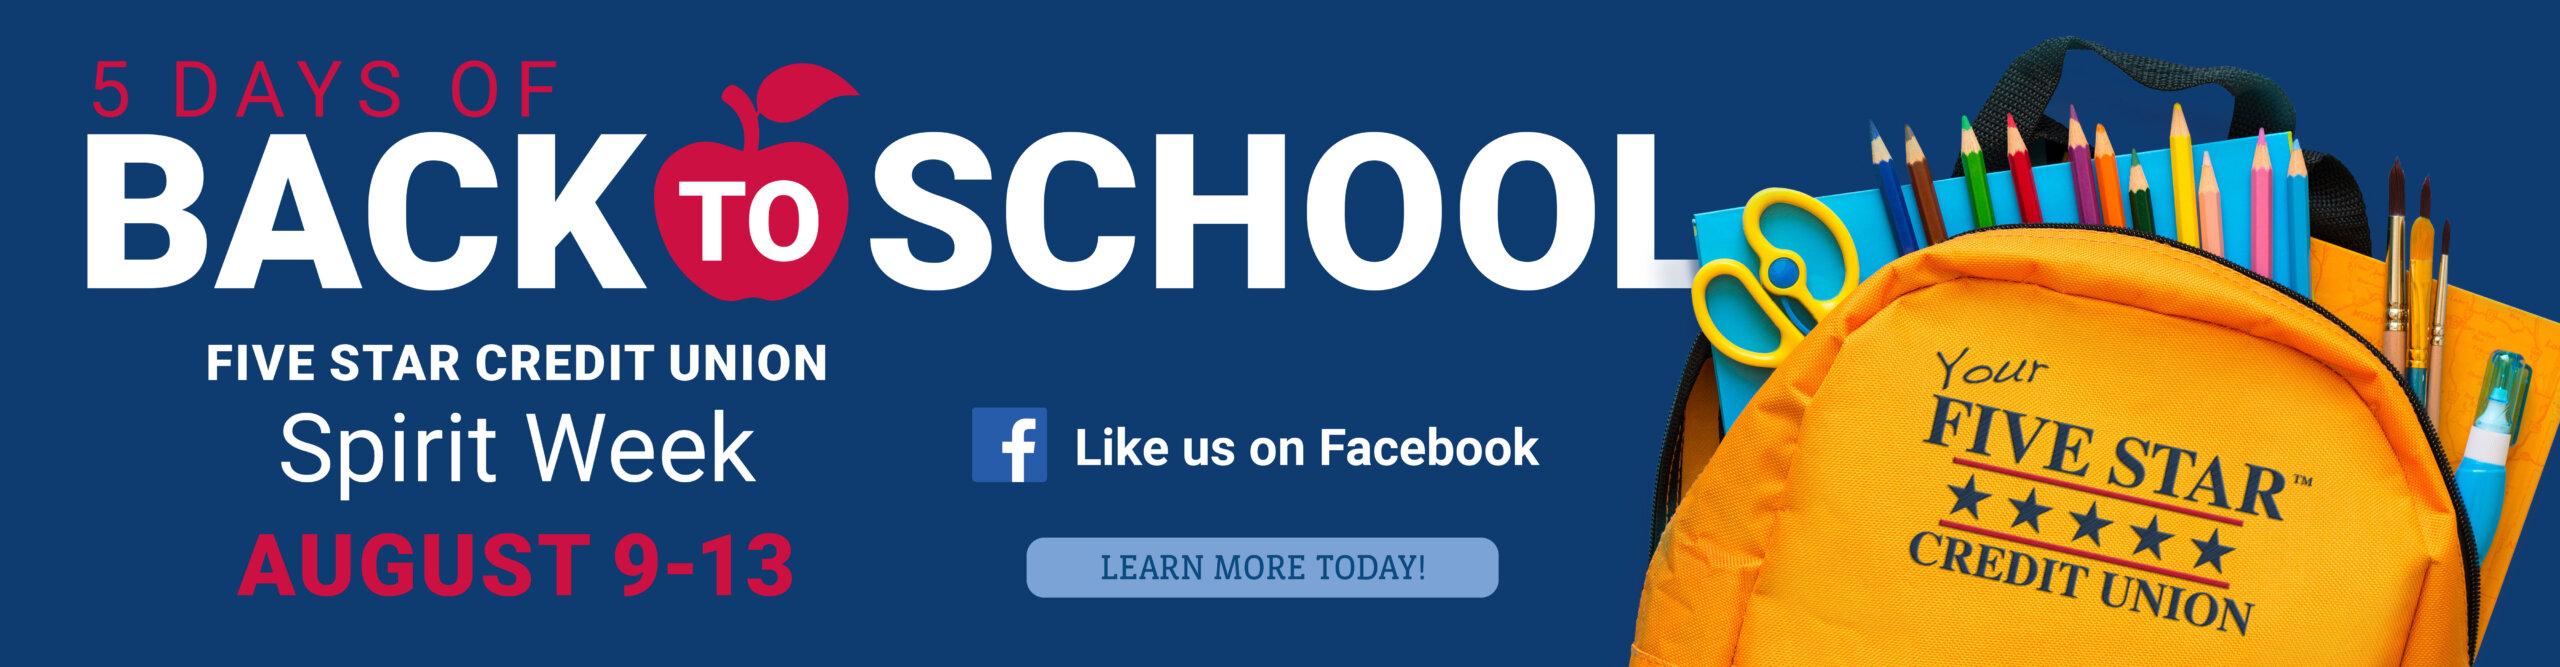 BackToSchool_WebBanner